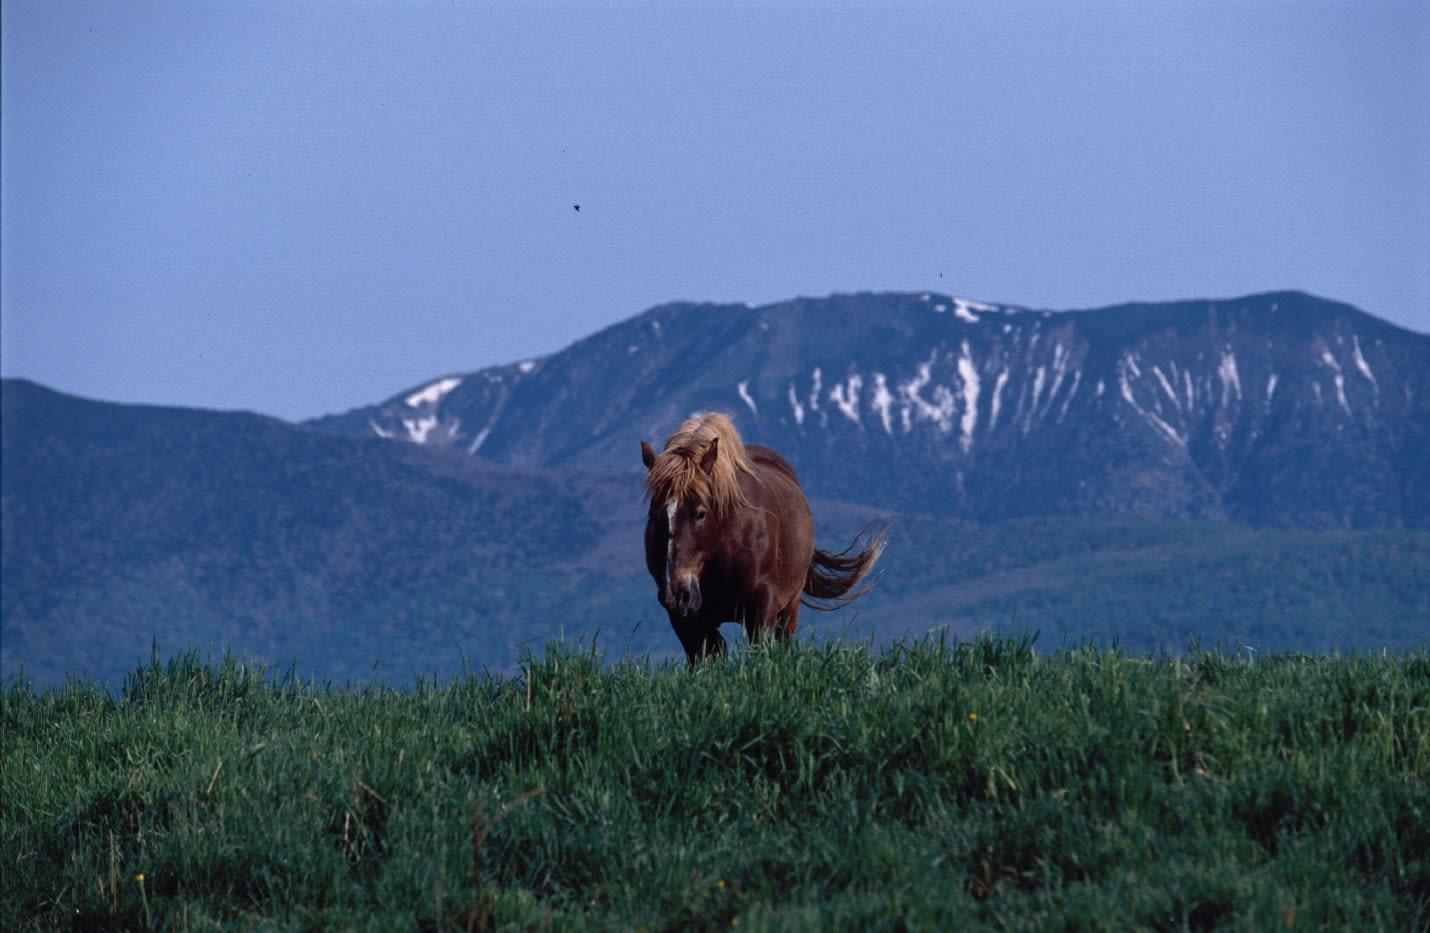 早池峰山の画像 p1_36